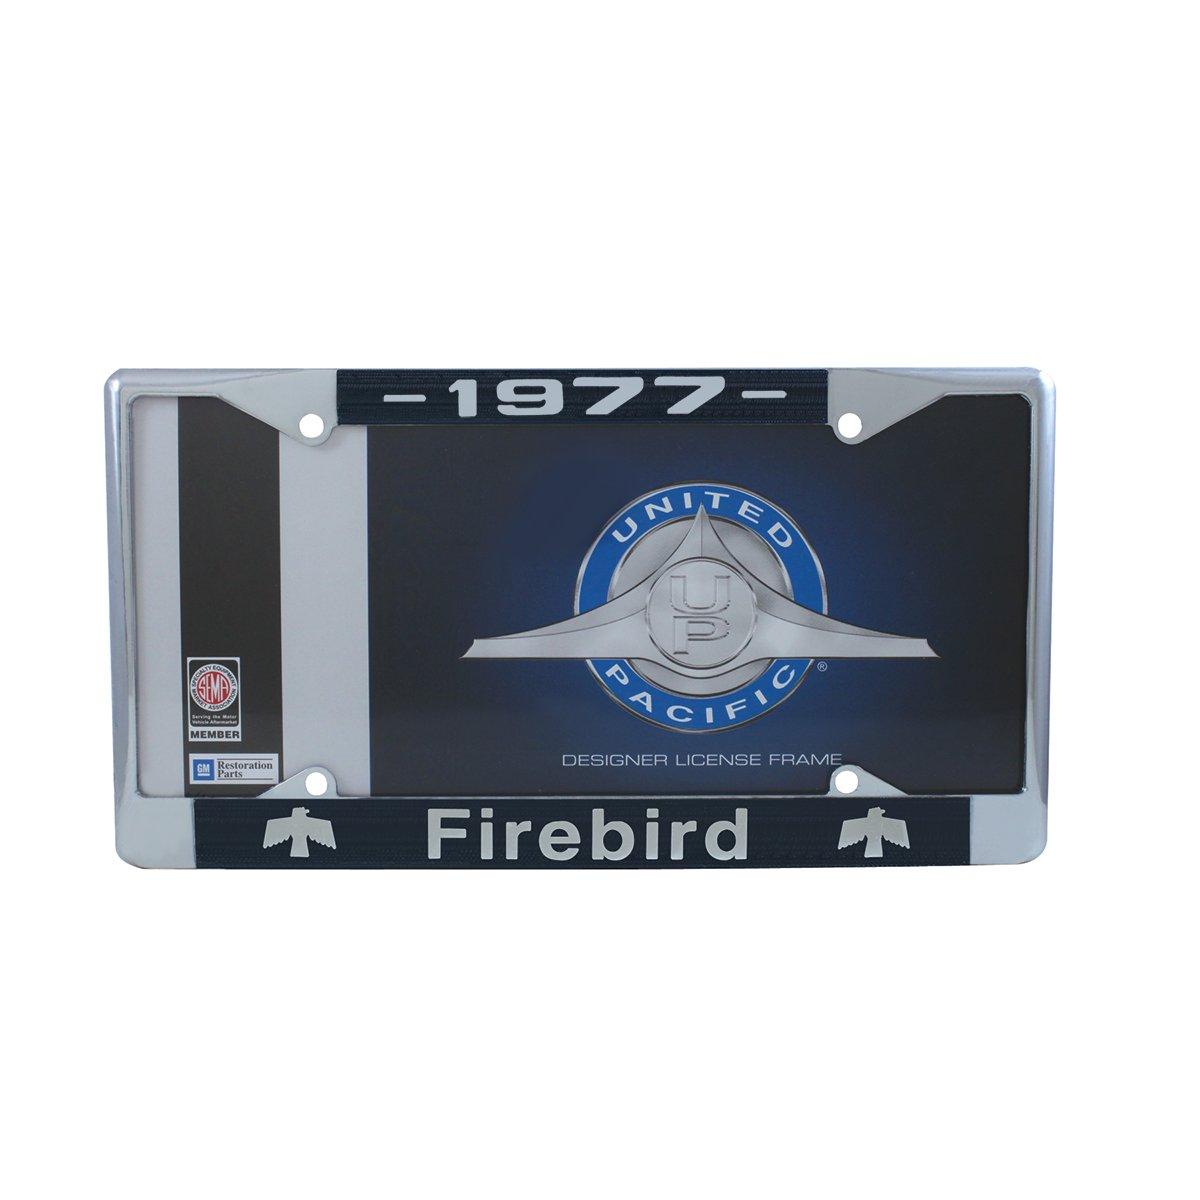 United Pacific C5039-77 1977 Firebird Chrome License Plate Frame